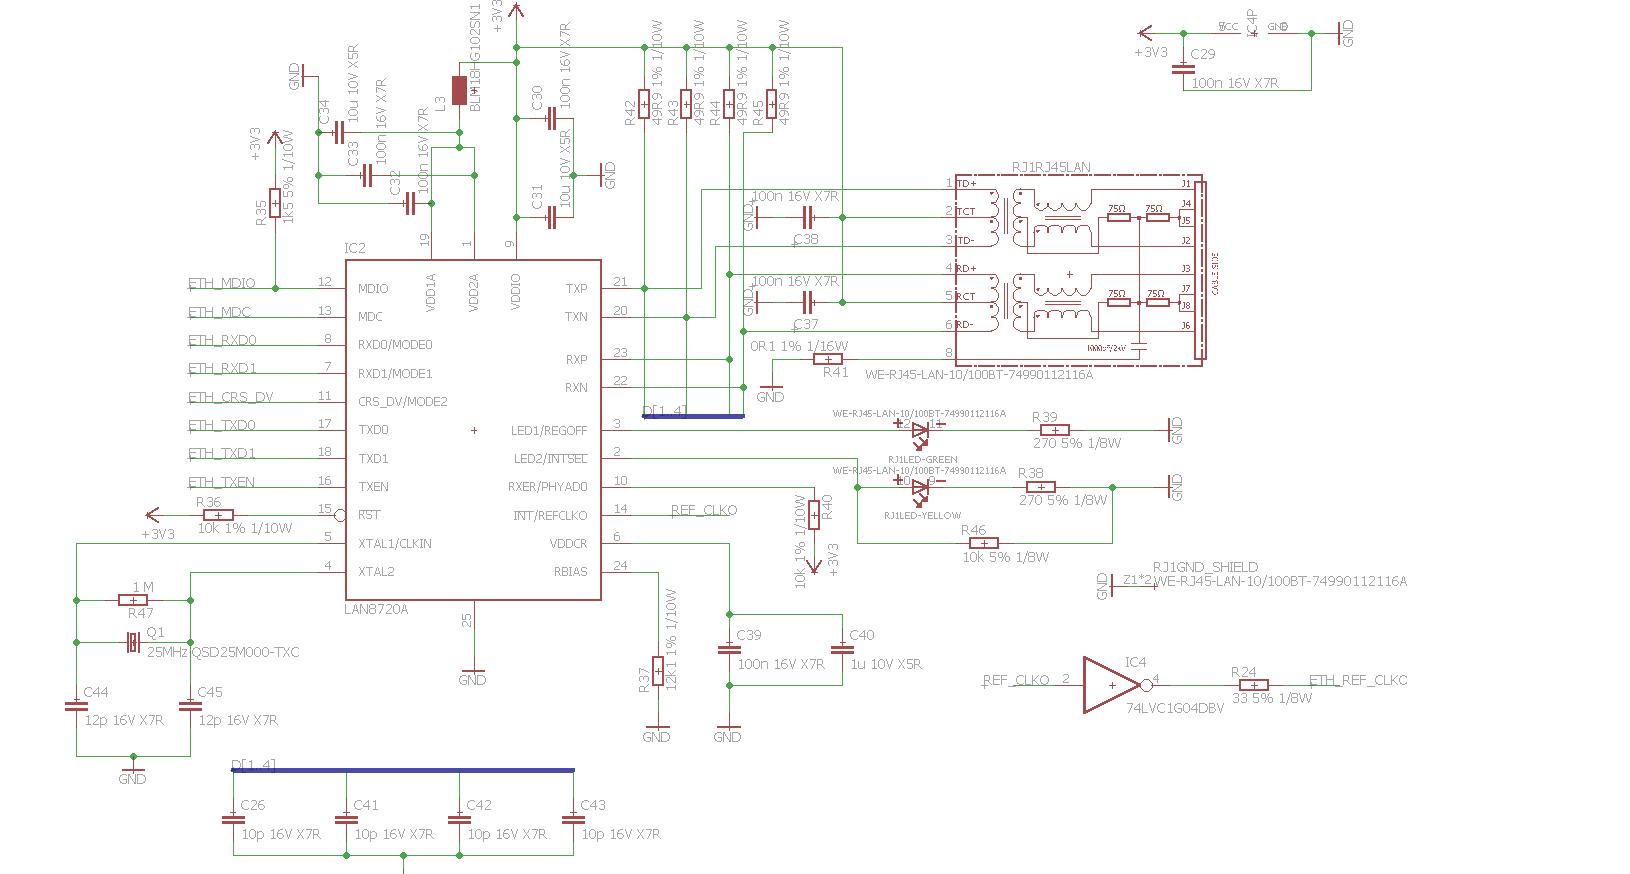 stm32f107 lan8720a ping - nieosiągalne IP - elektroda pl